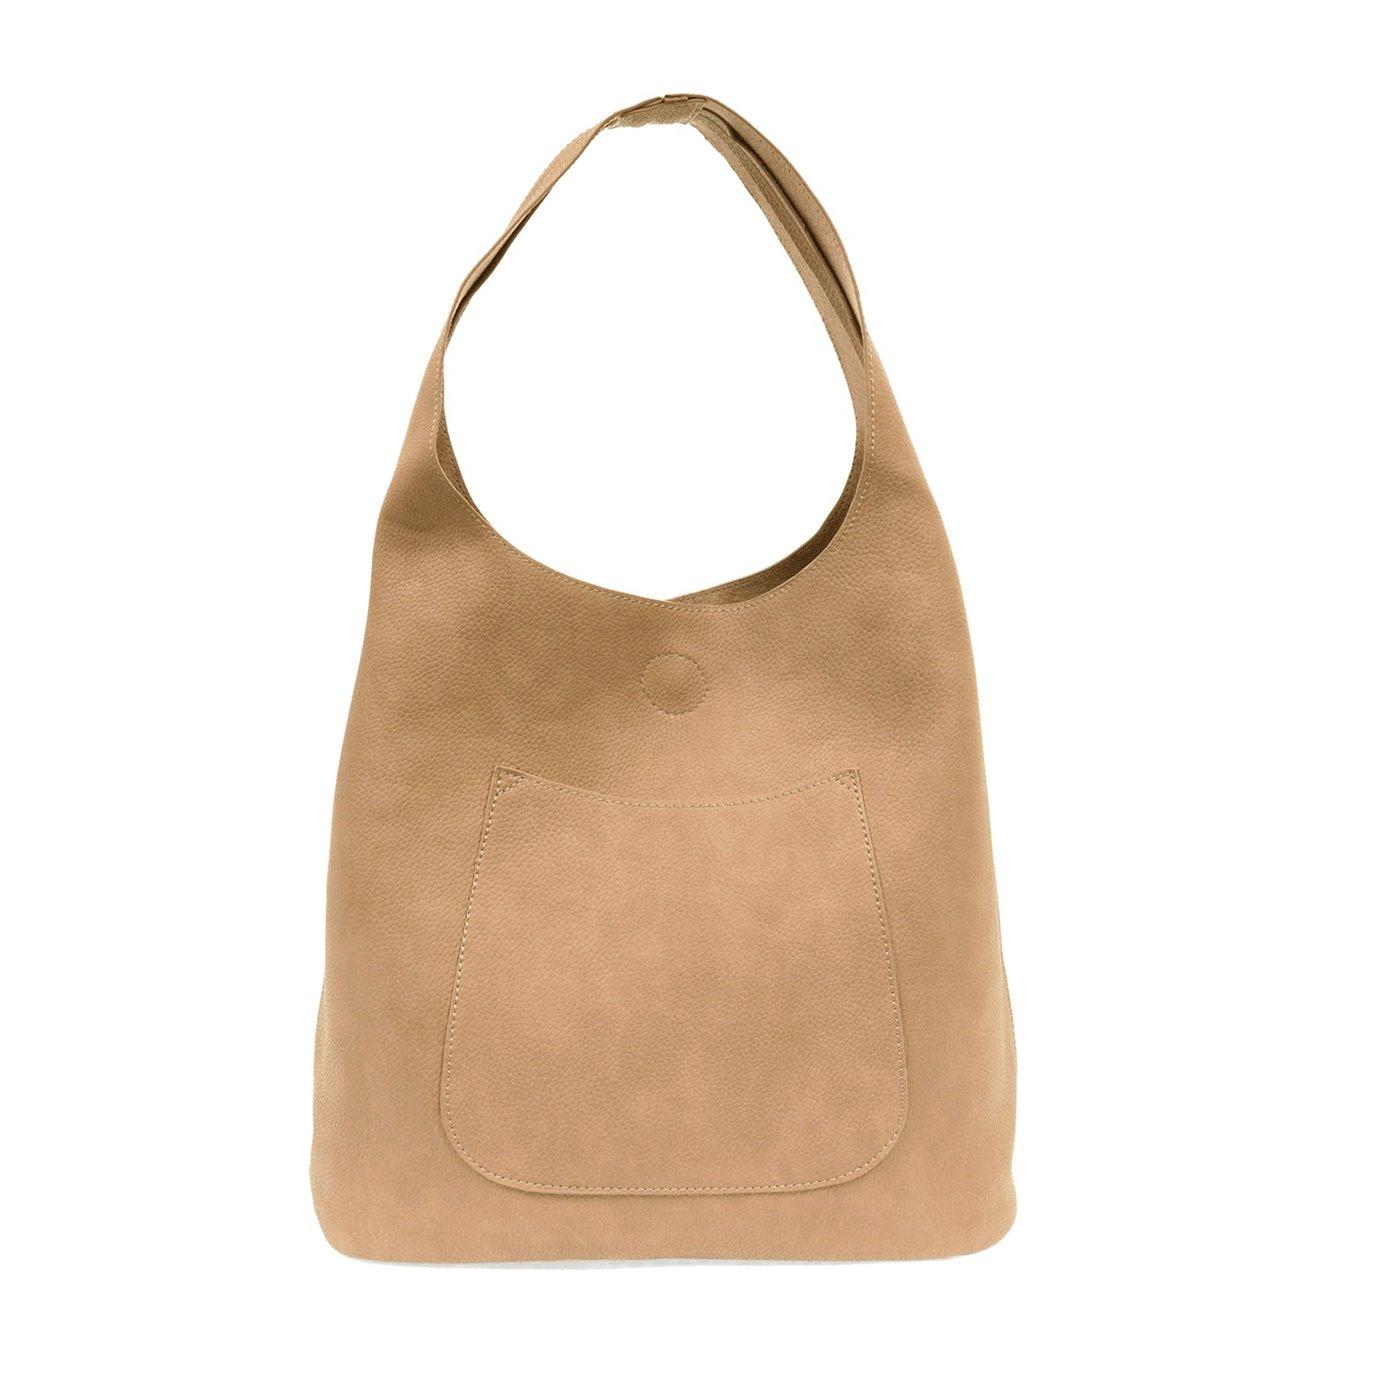 Camel Molly Slouchy Hobo Handbag